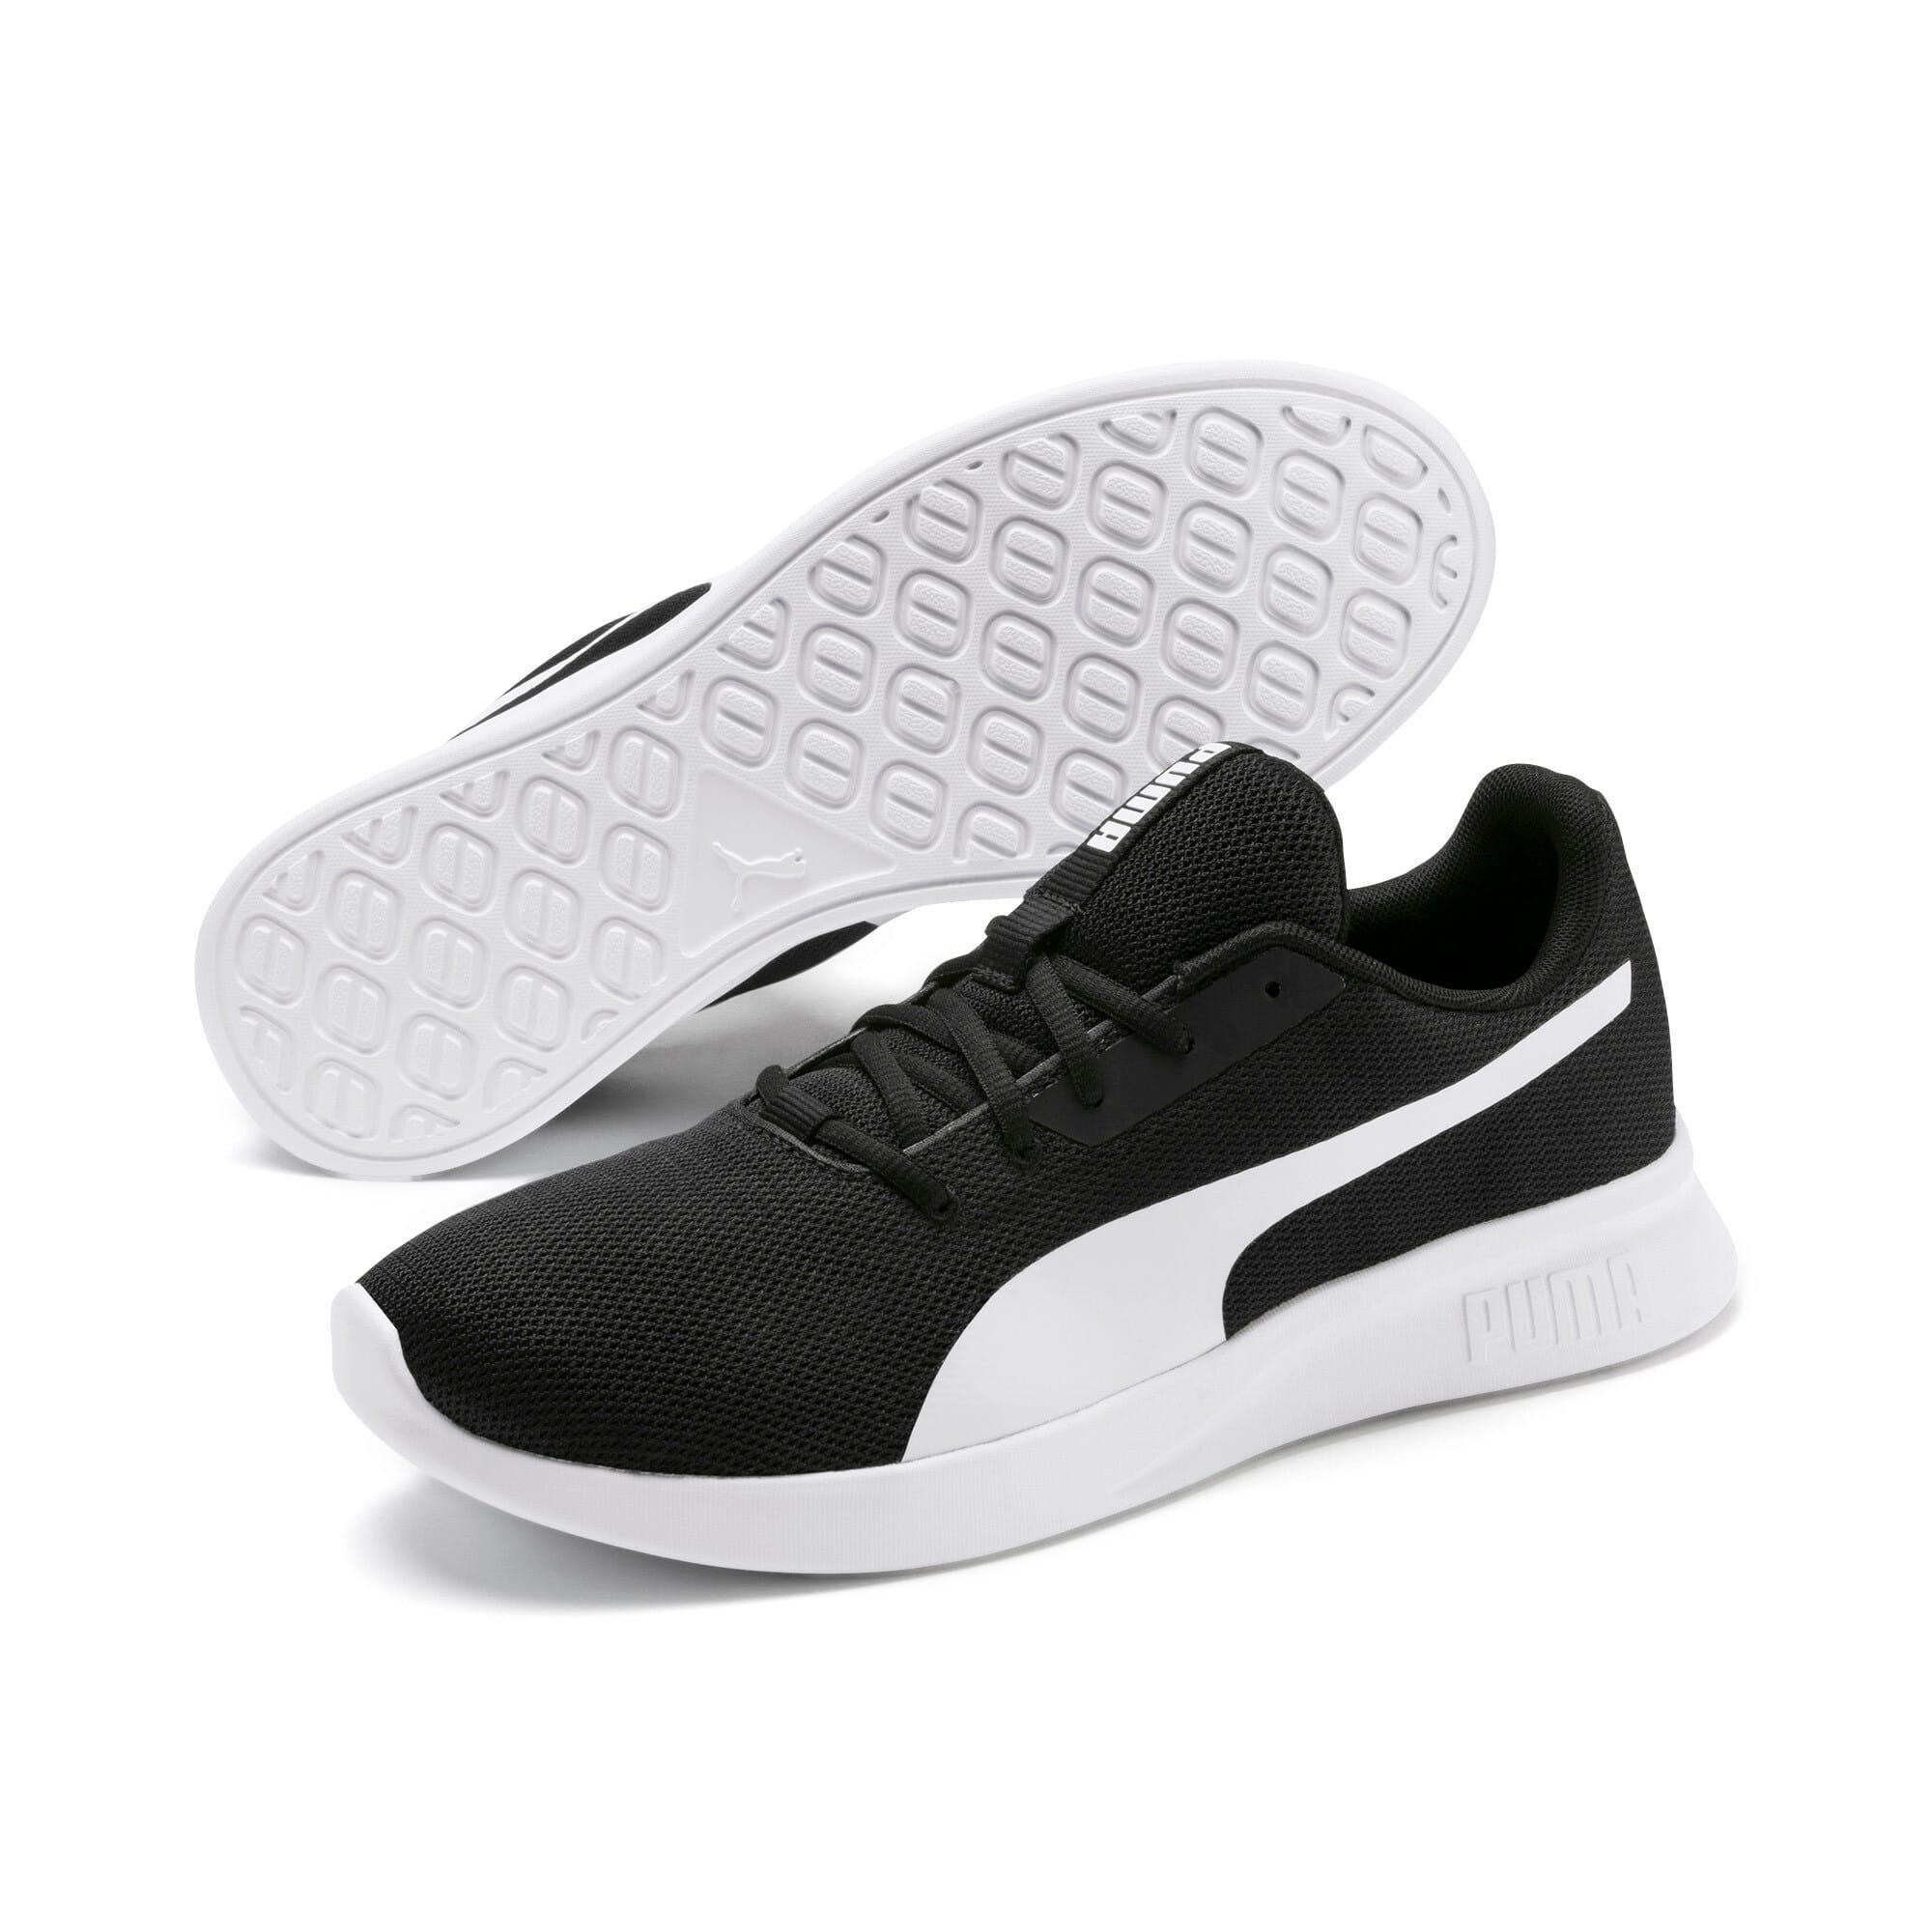 Thumbnail 4 of Modern Runner Sneakers, Puma Black-Puma White, medium-IND